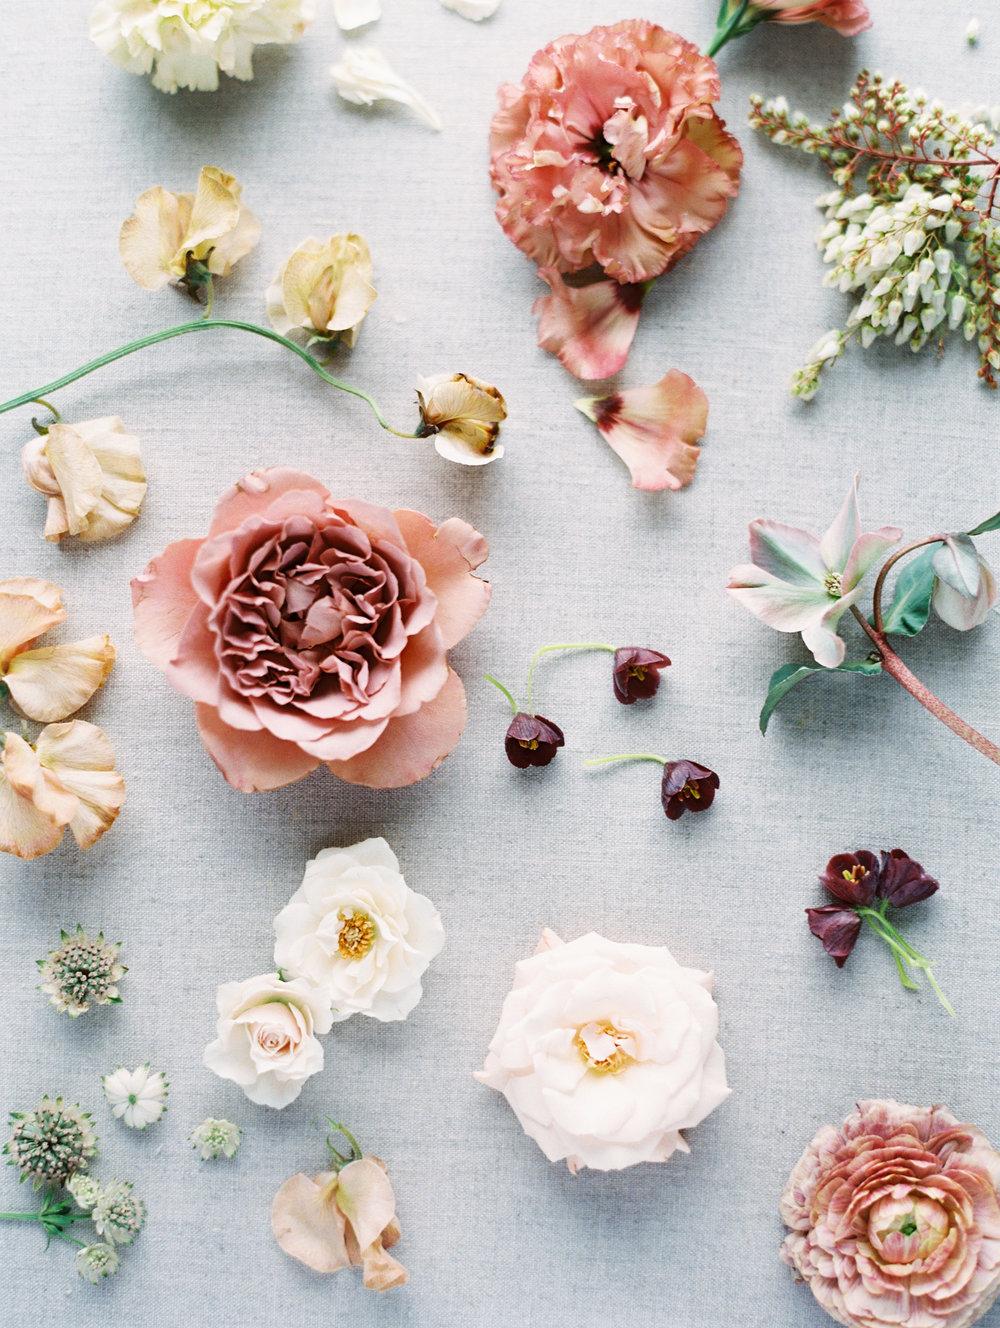 Florals - The Romanticist Studios